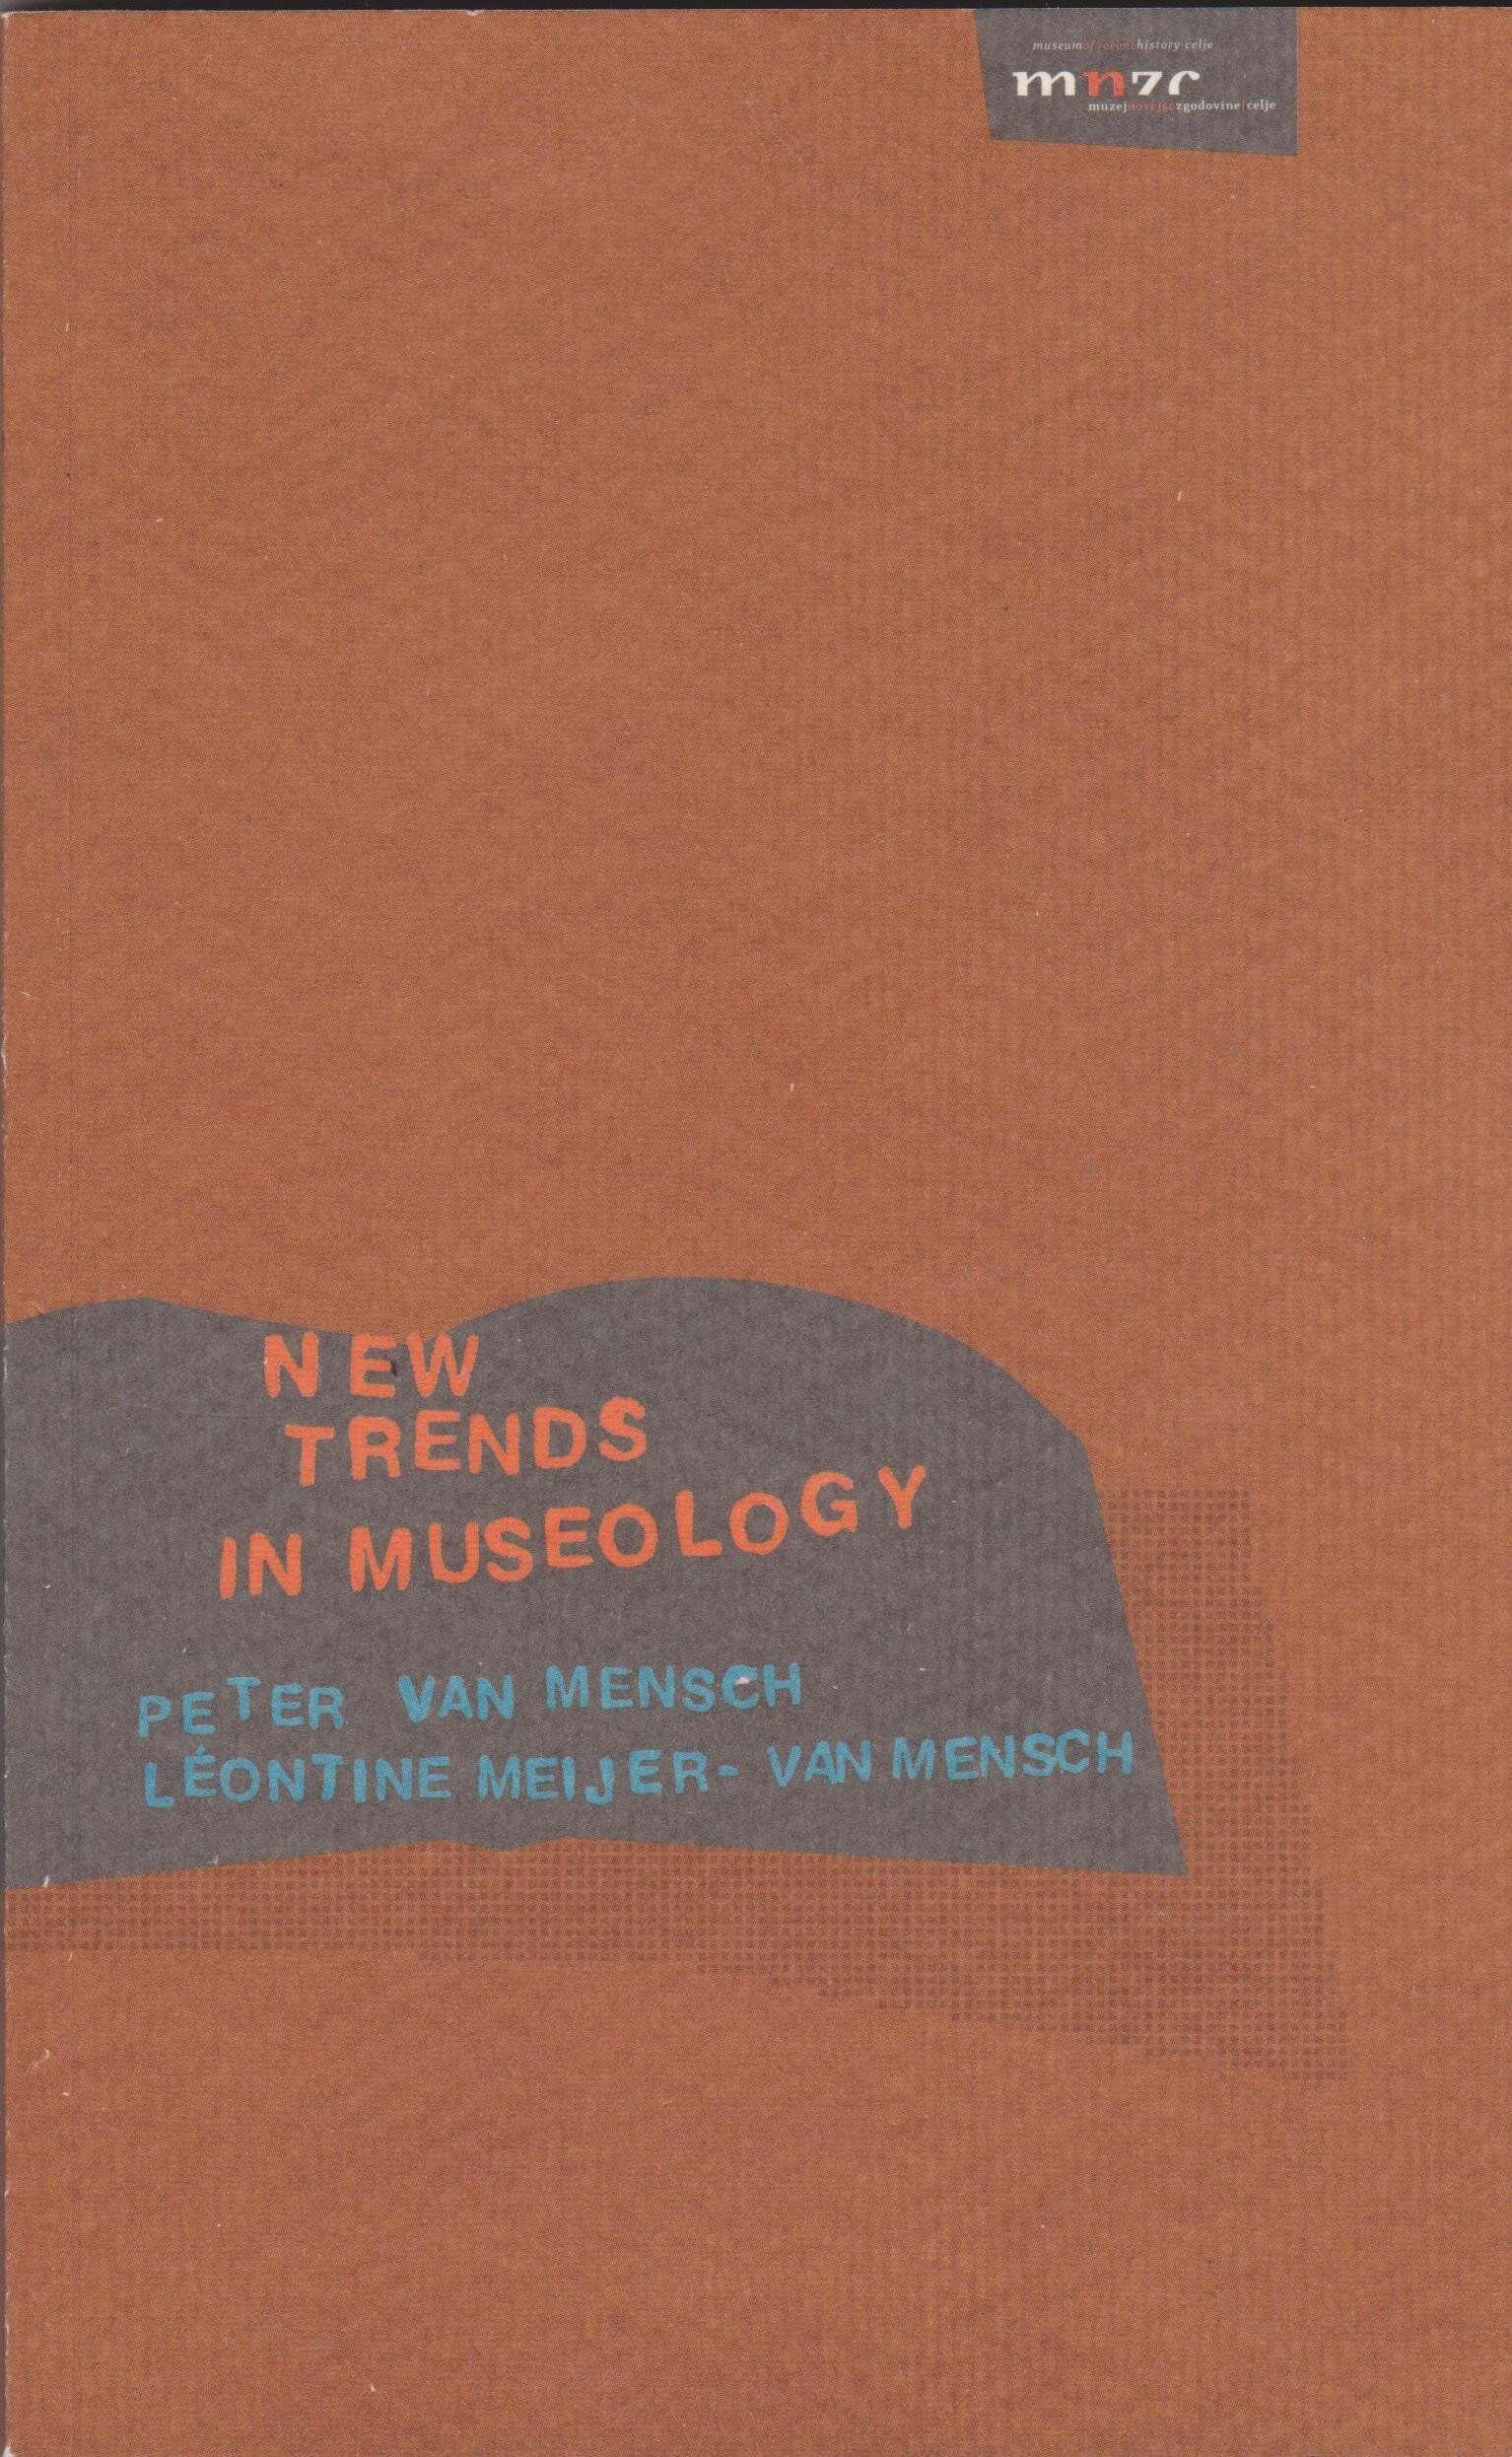 Book review. Van Mensch P; Meijer-van Mensch L (2021) New Trends in Museology (trans. into Russian Ananev VG)